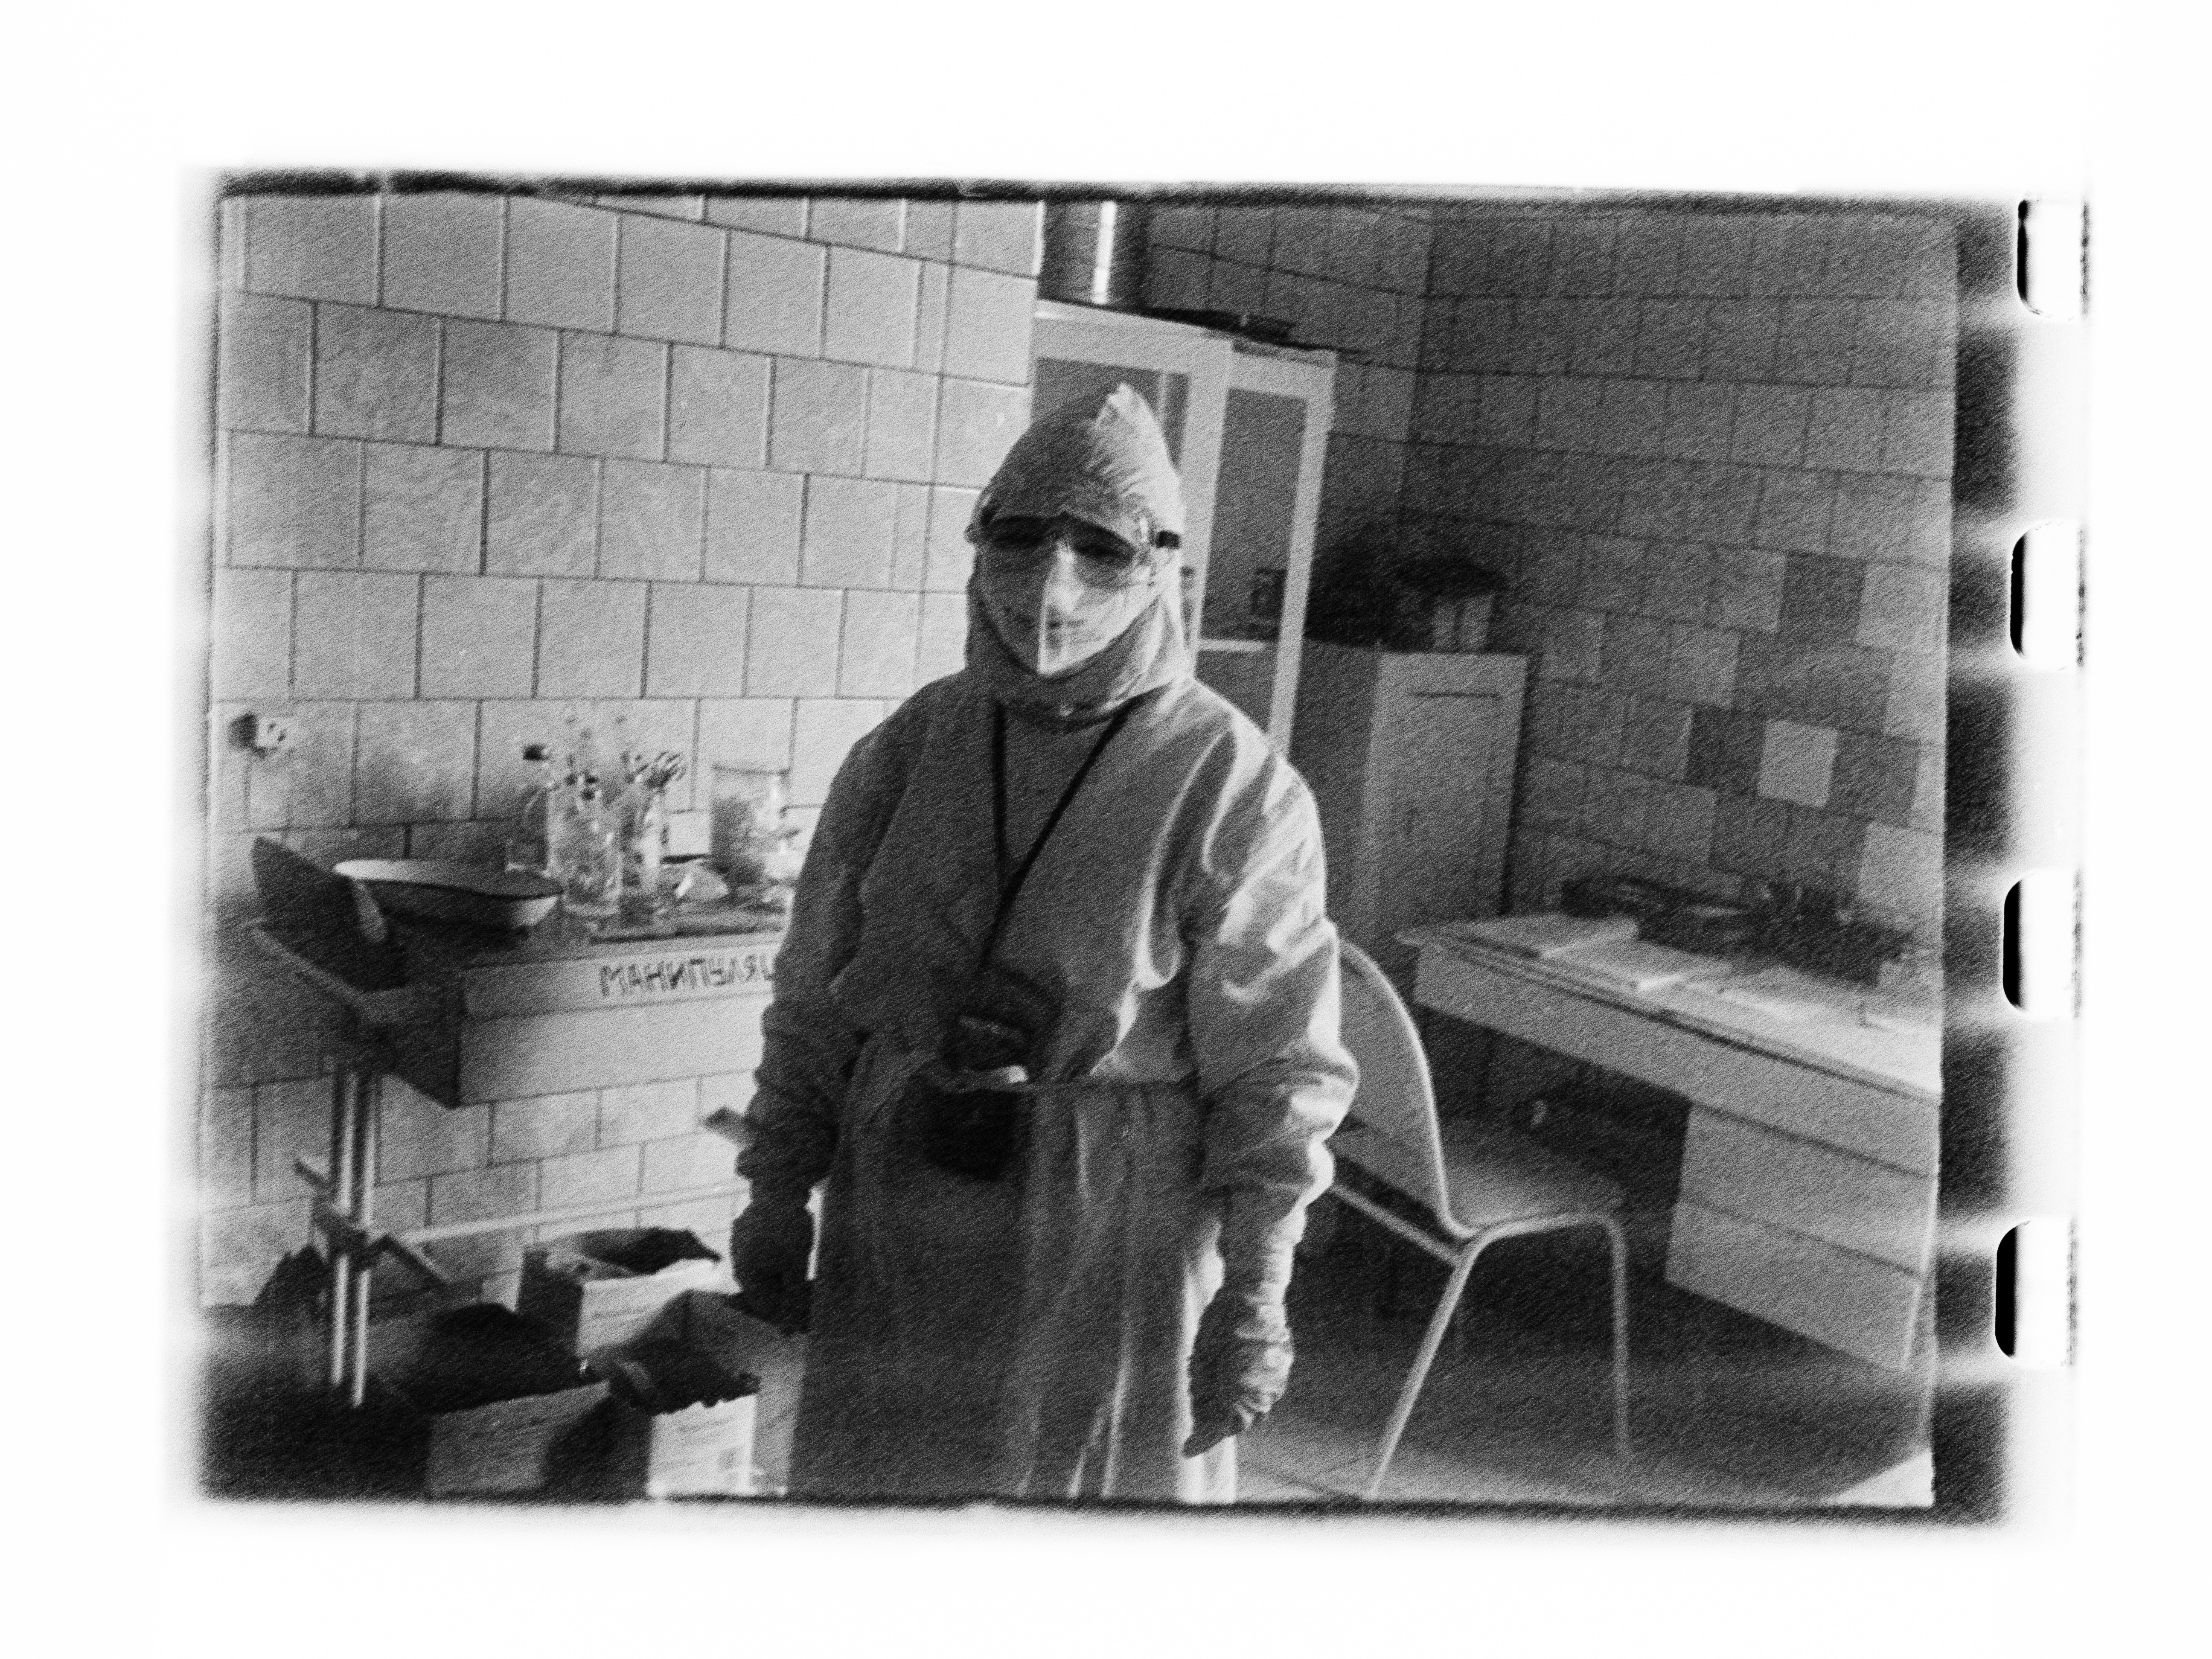 Medic in ward (Pic: Andrey Khludeyev)